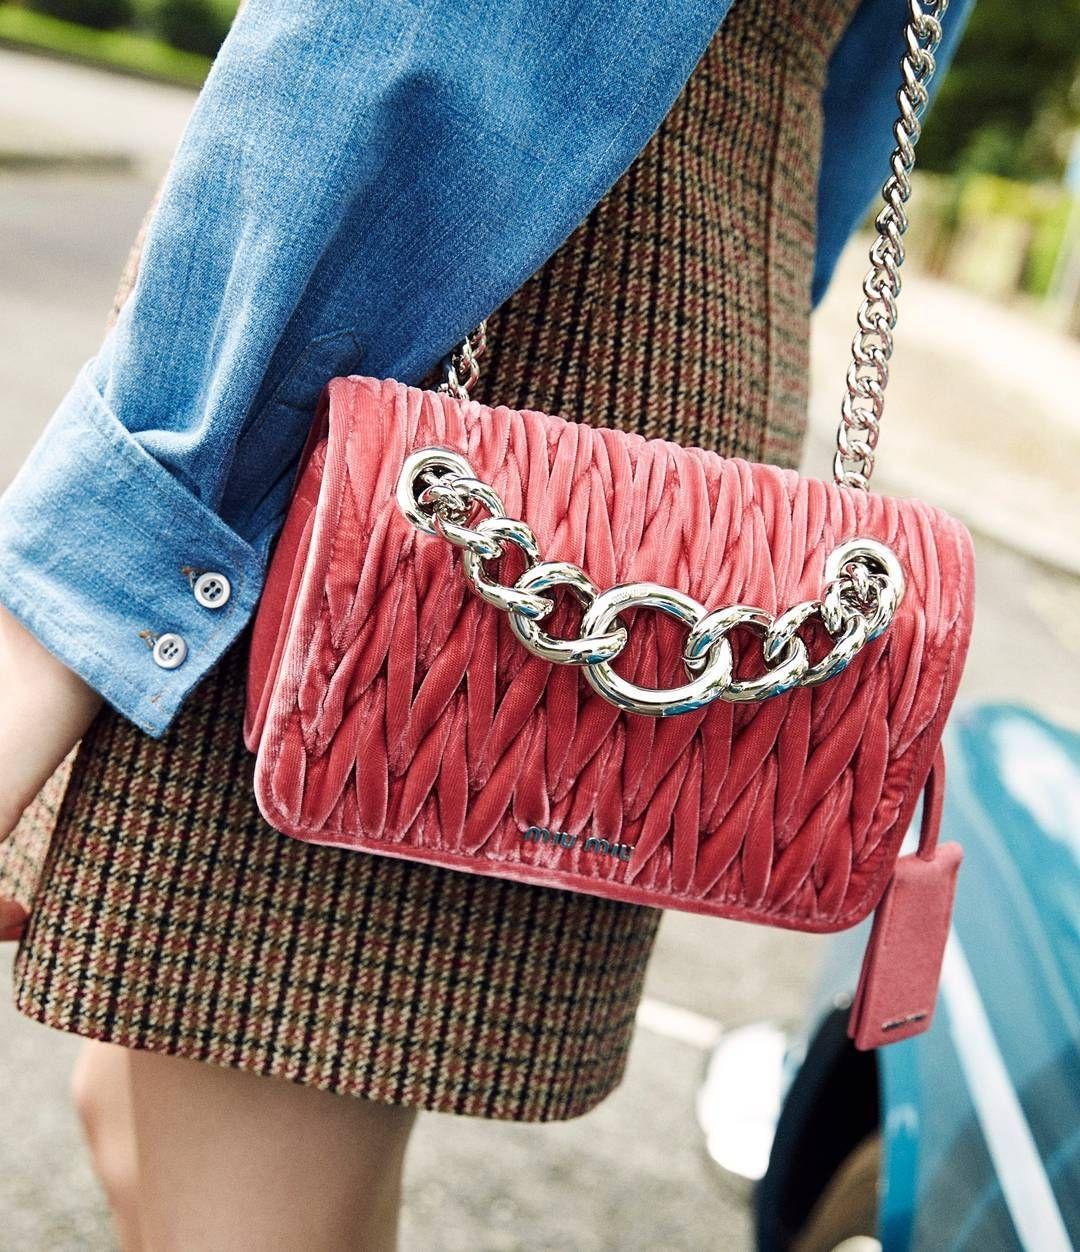 Velvet Miu Miu Club shoulder bag with matelassé workmanship ( link in bio   ilariaorsini) 7df0fb1be3c6d